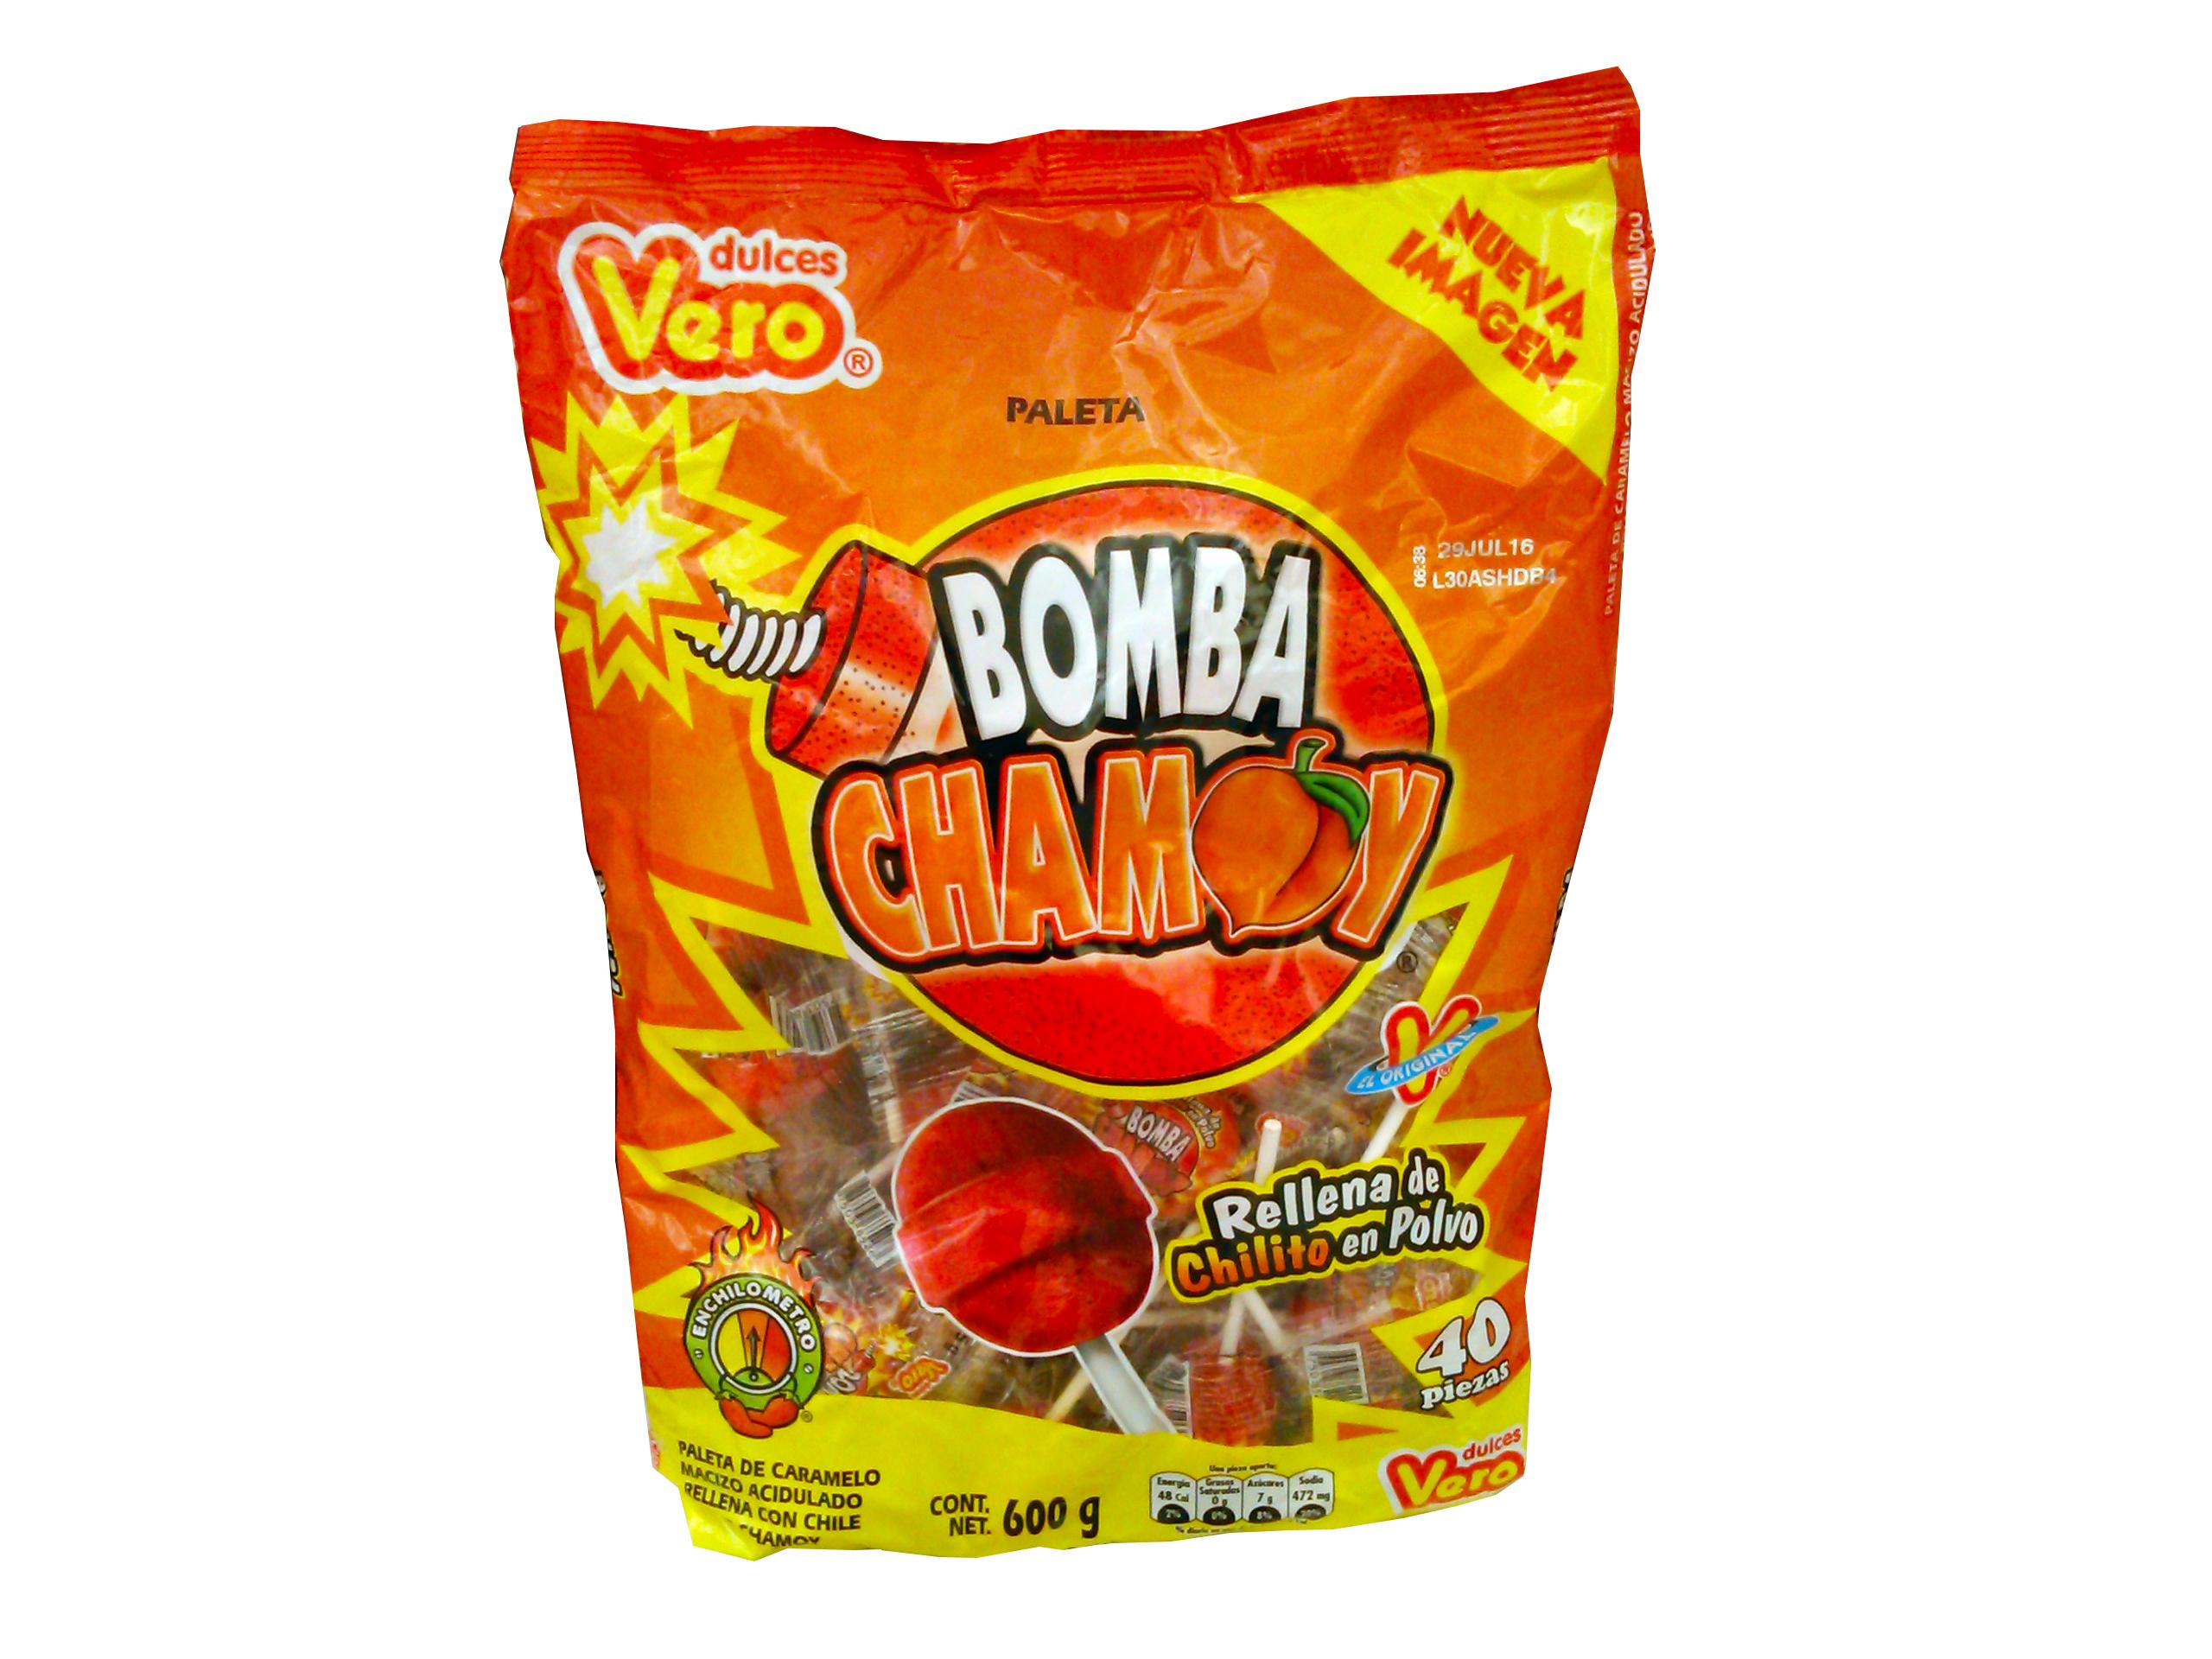 VERO  BOMBA CHAMOY